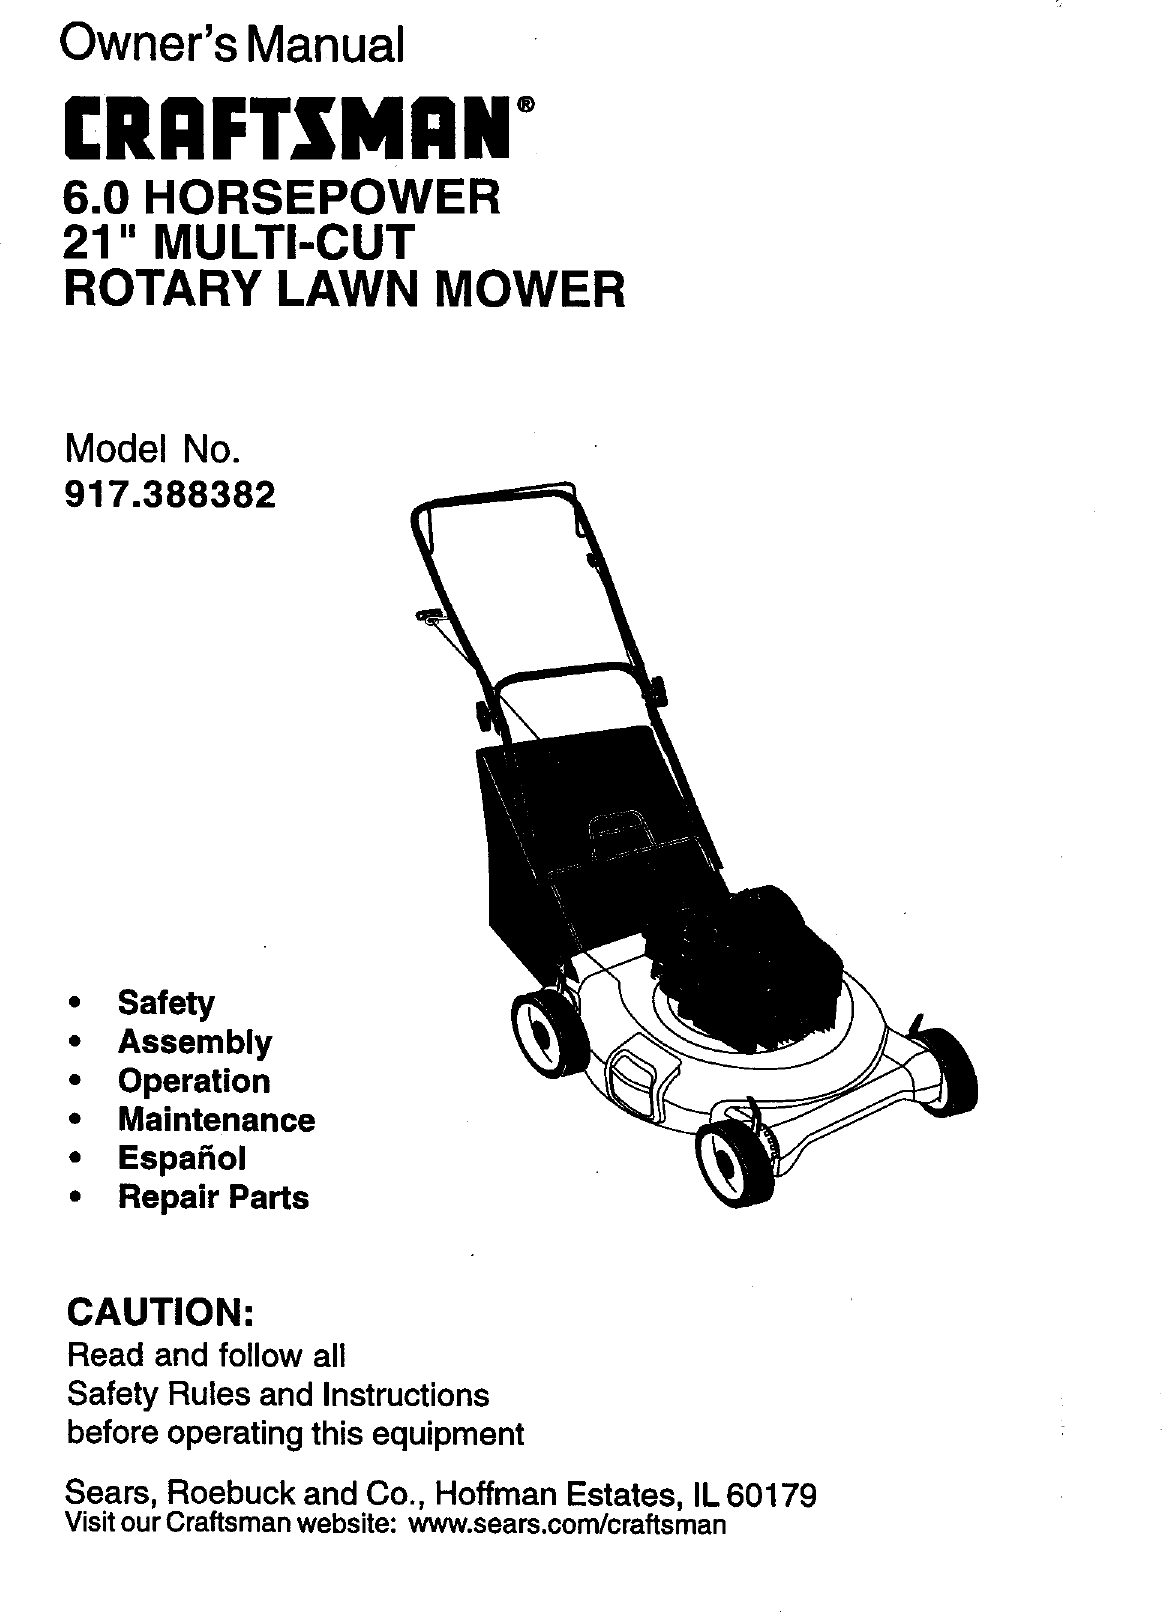 Craftsman 917388382 User Manual 6.0HP 21 ROTARY LAWN MOWER